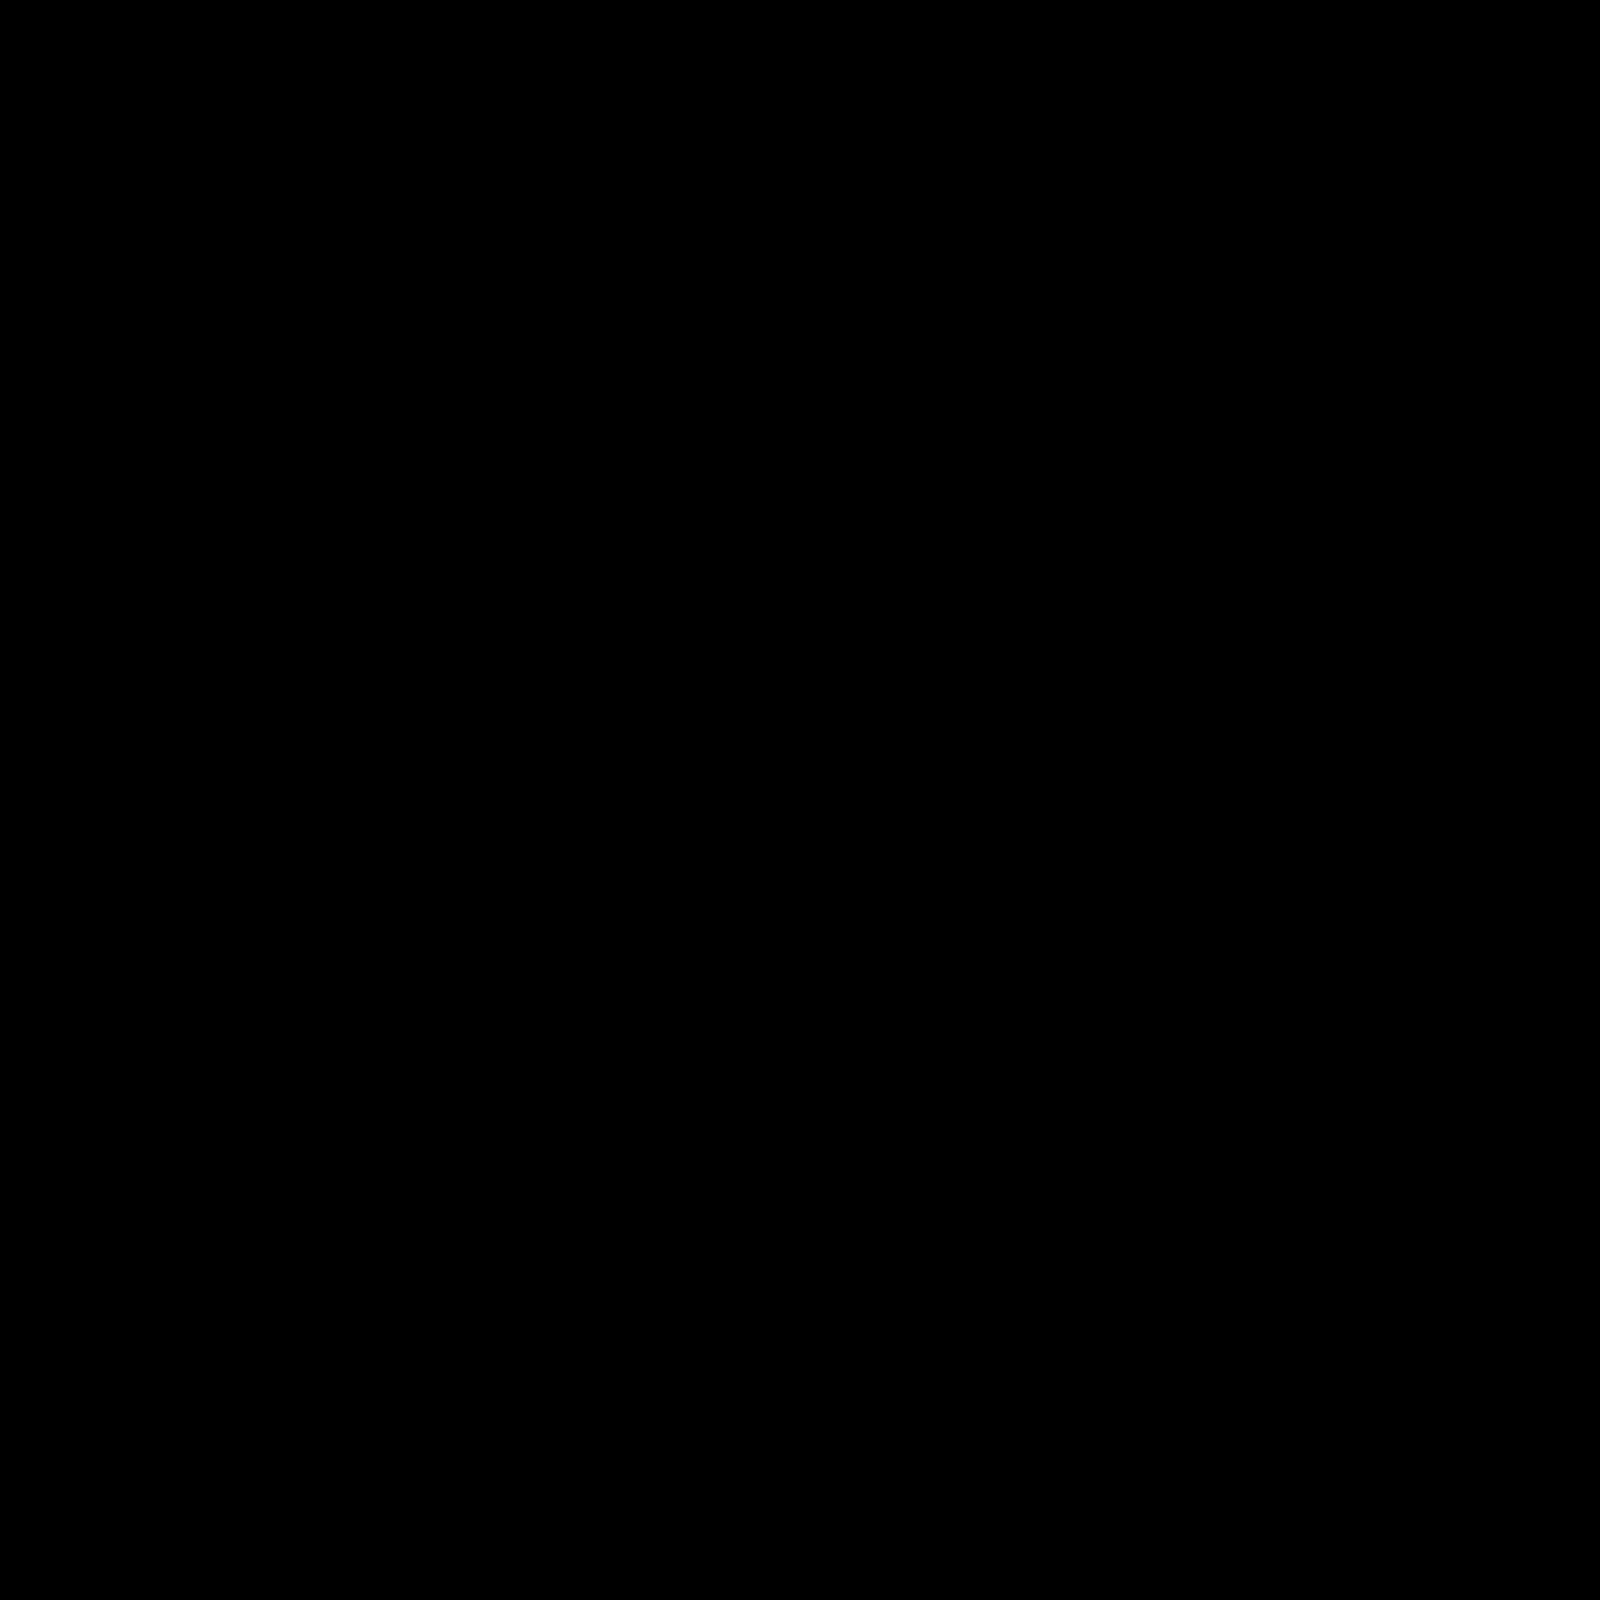 Weight Pound icon